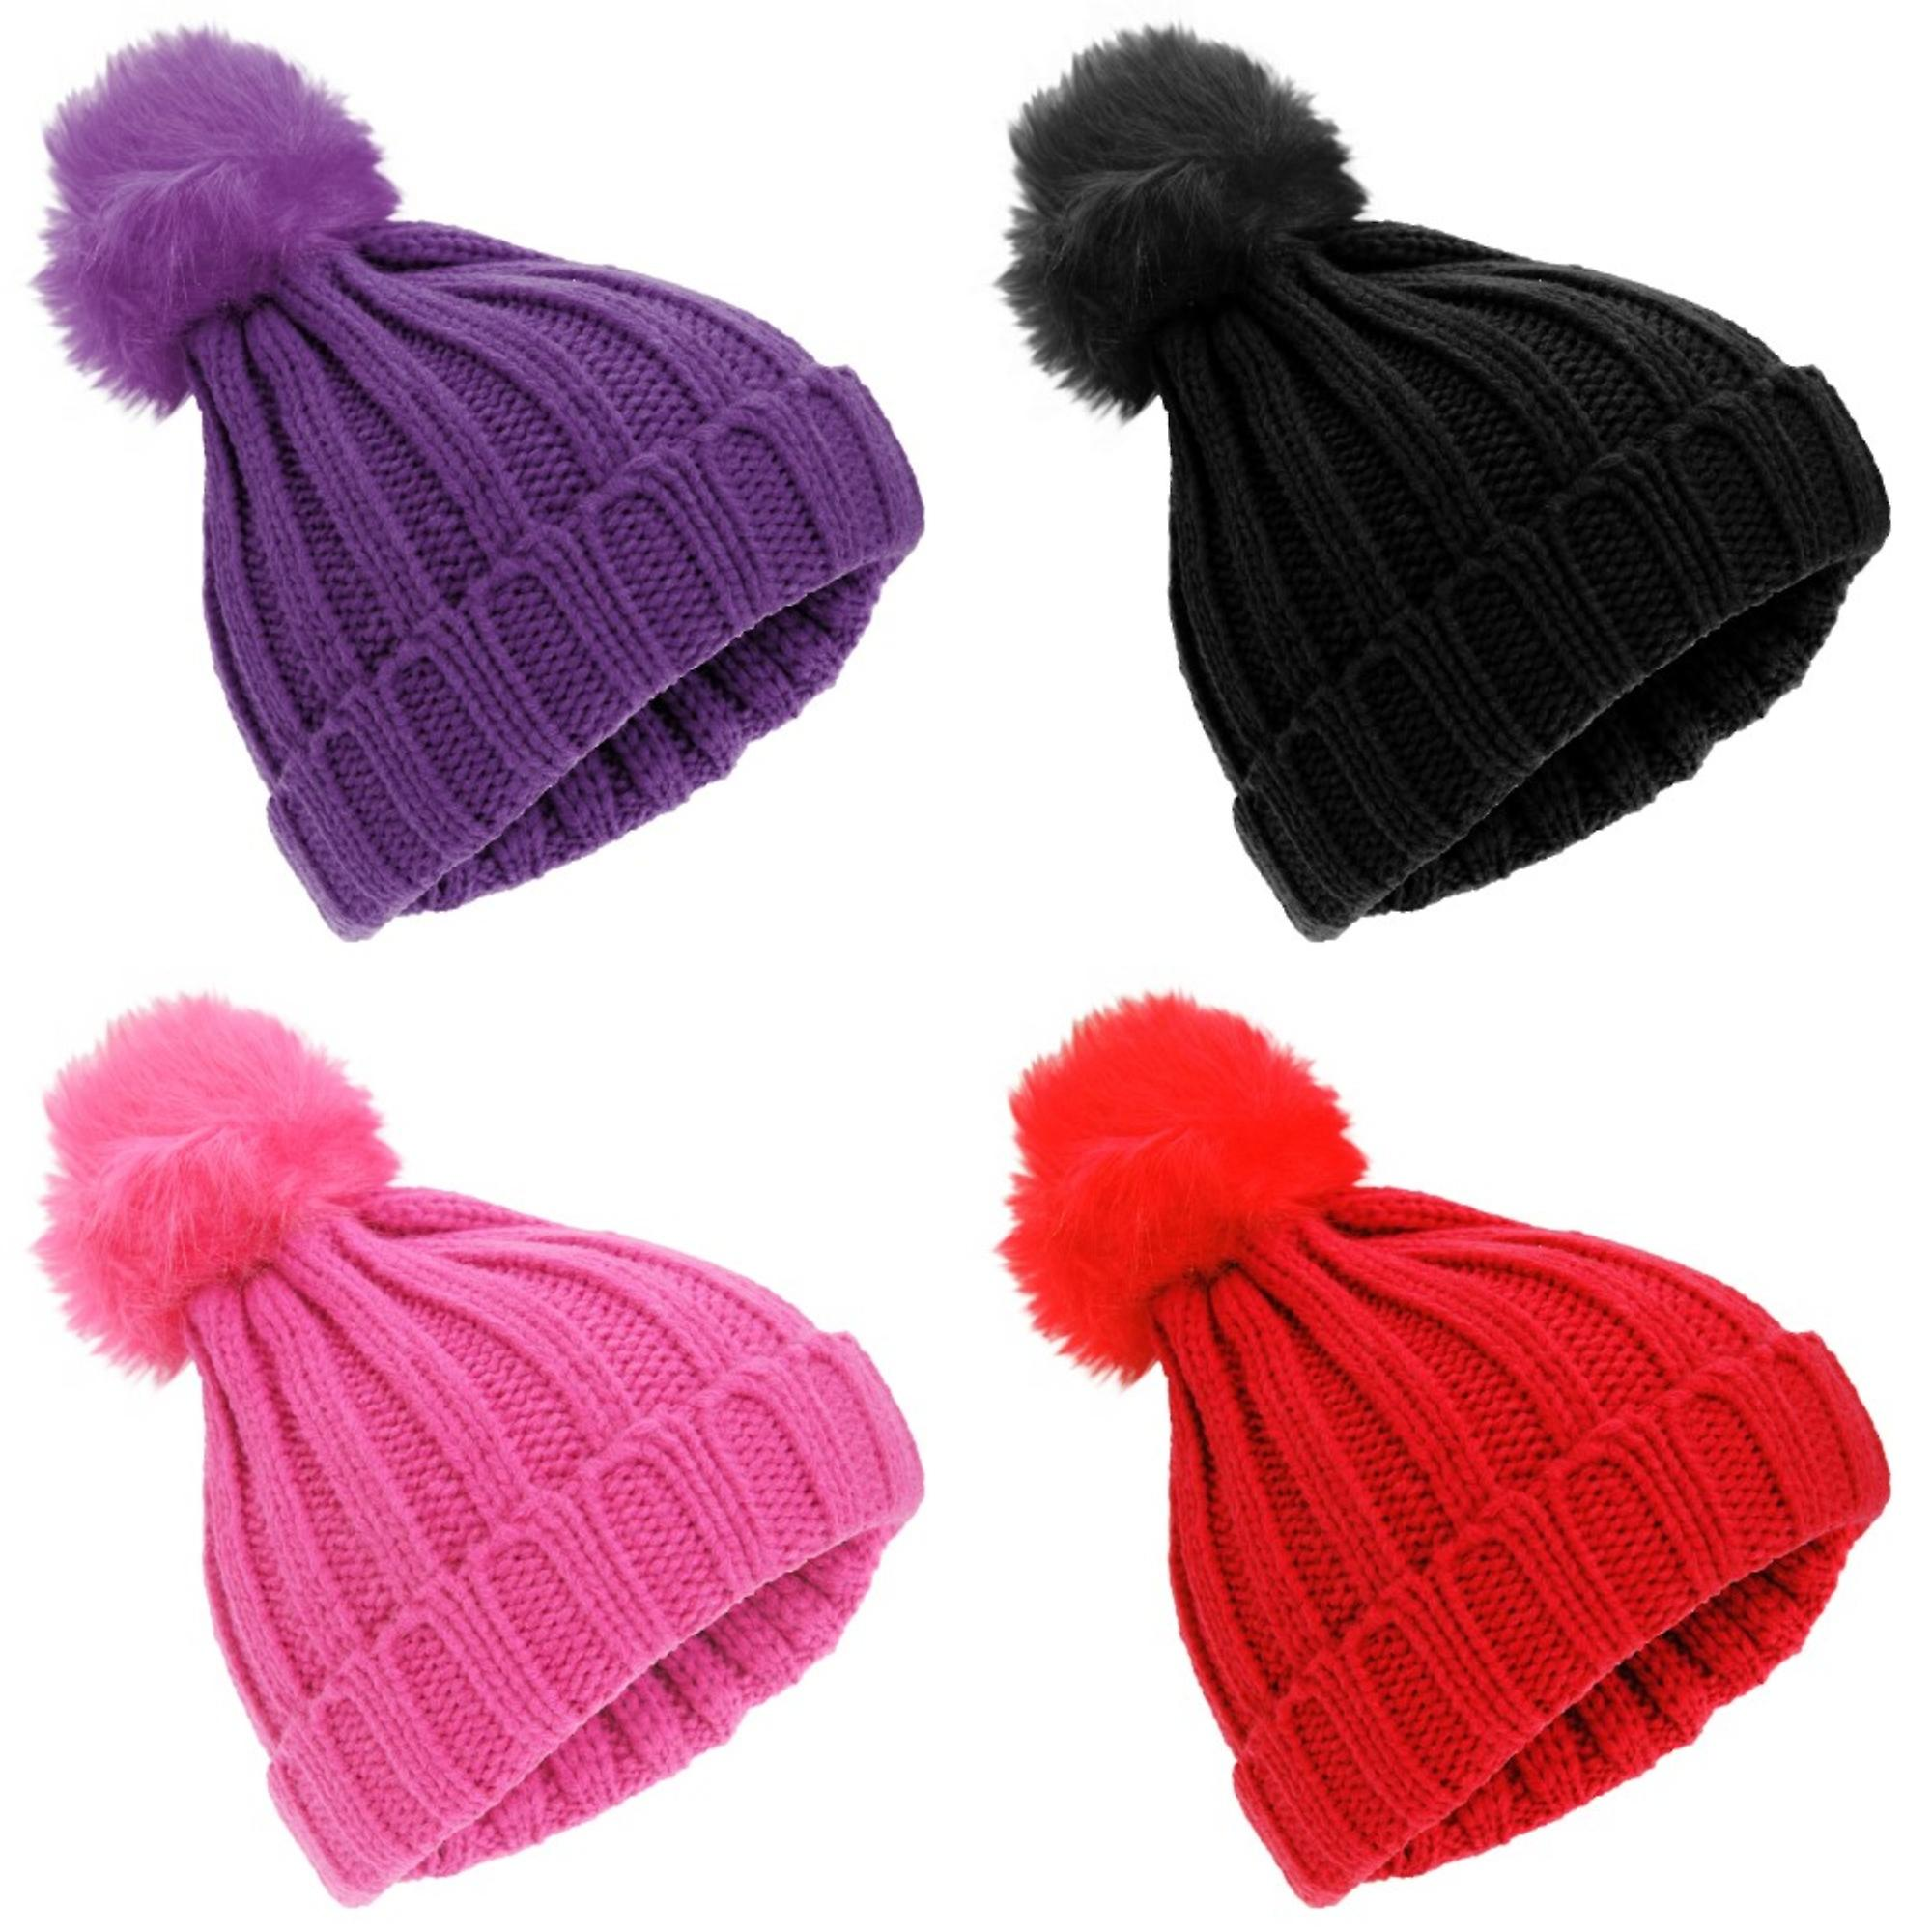 Universal Textiles Childrens Girls Rockjock Cable Knit Faux Fur Pom Pom Winter Beanie Hat